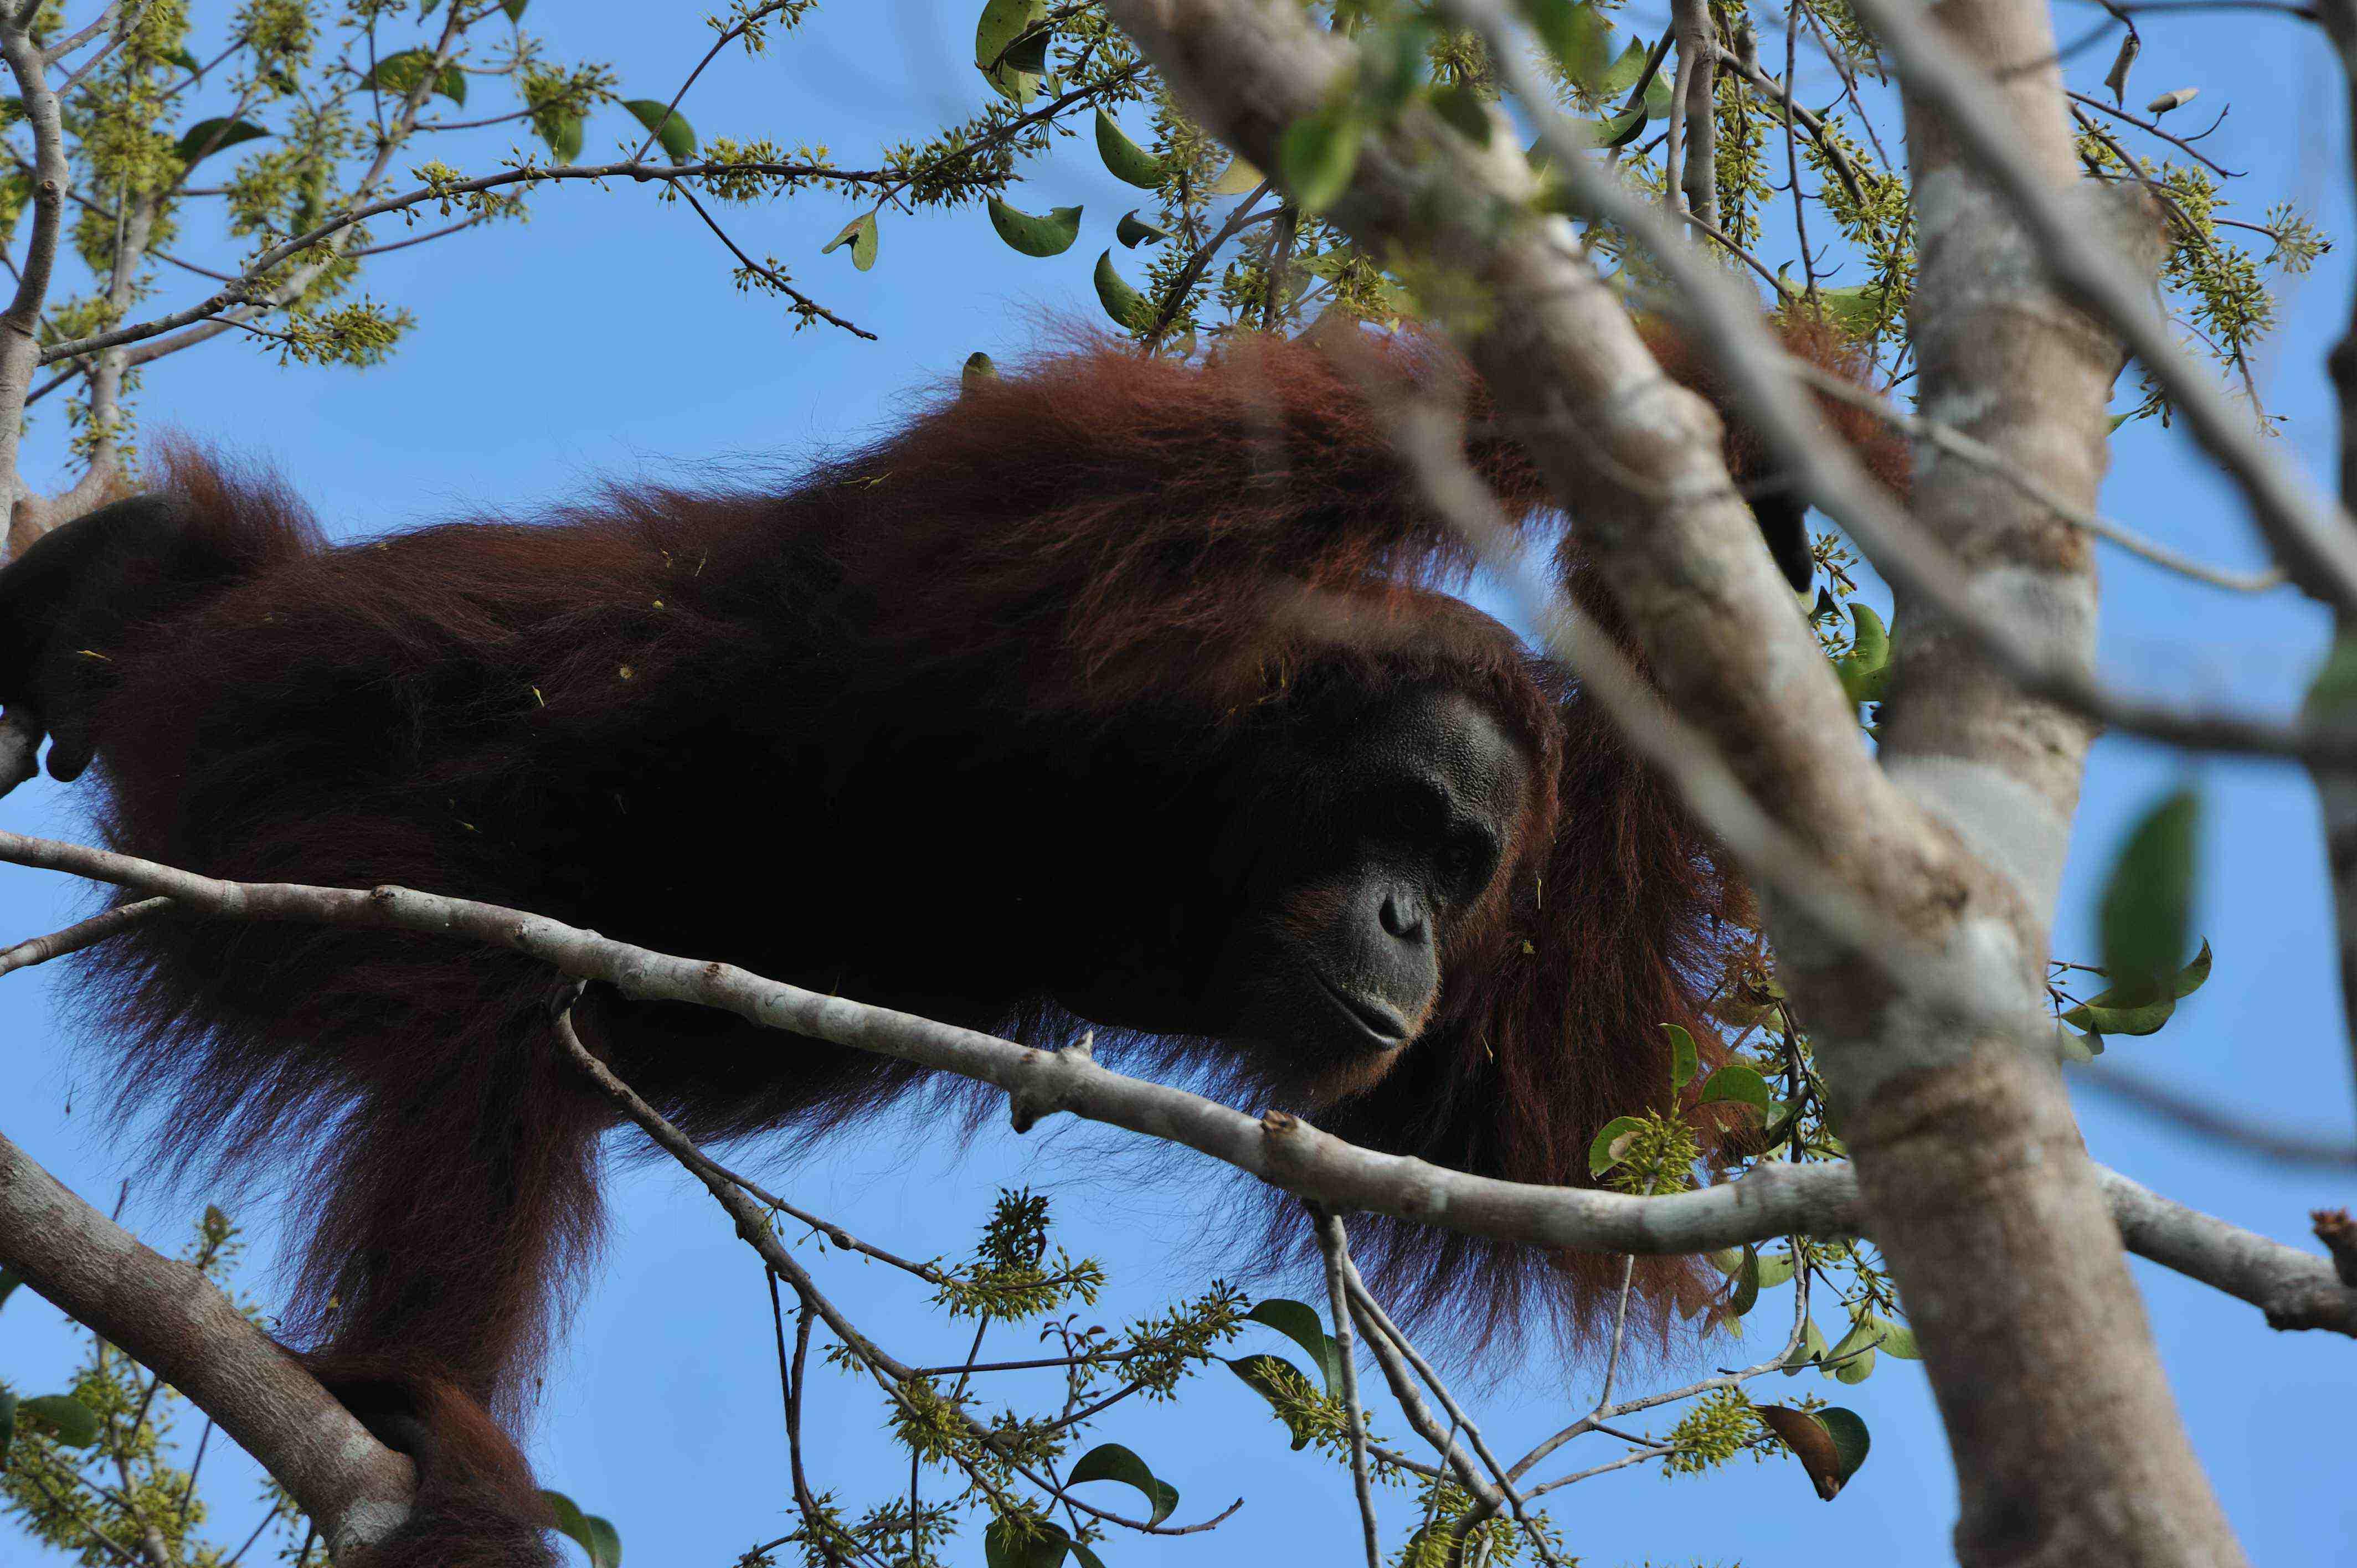 kalimantan,orangutan,forest,wildlife,reservation,booking,hotel,lodge,jungle,flora,fauna,borneo,accommodation,ticket,flight,airline